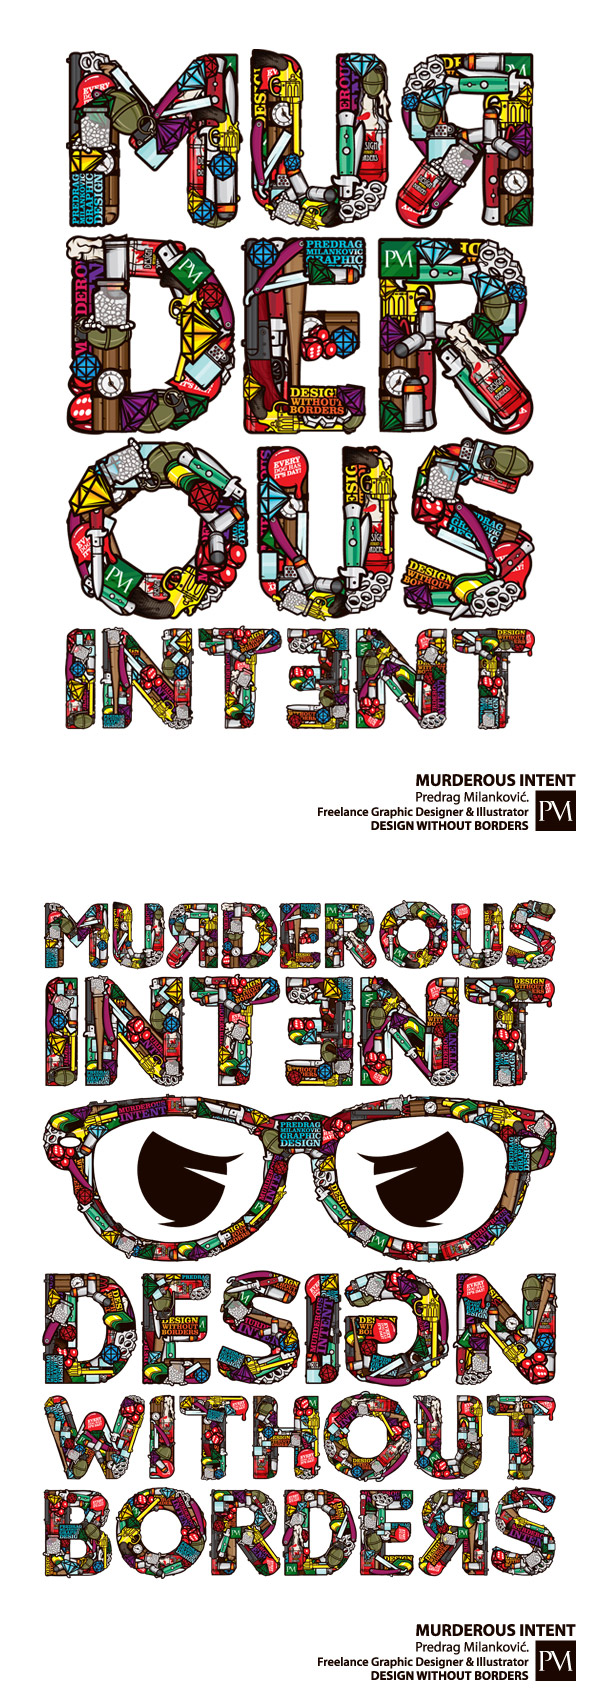 Murderous Intent by Predrag Milankovic